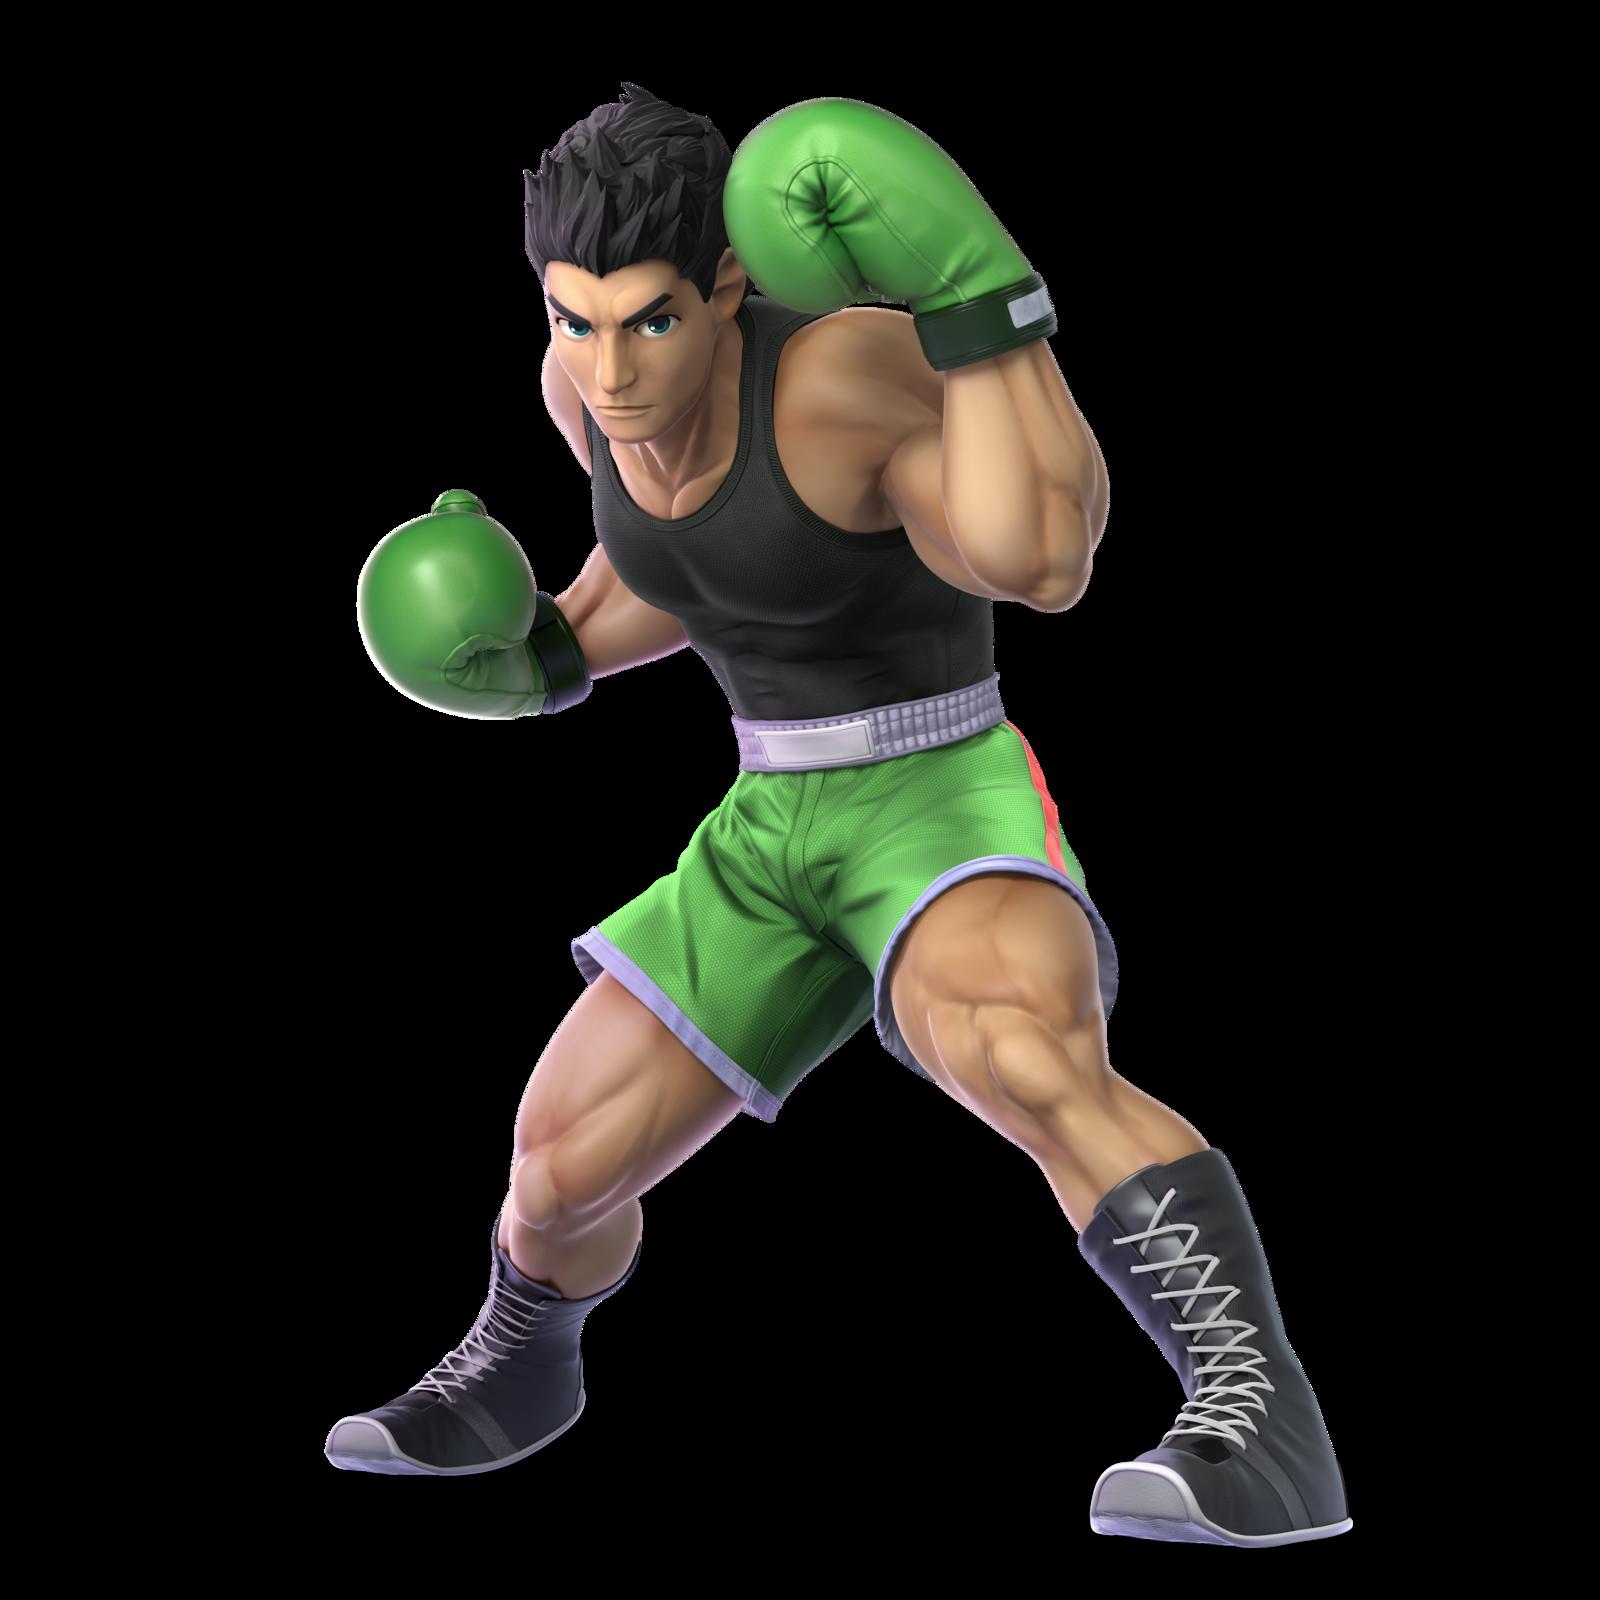 Little Mac | Punch-Out!! Wiki | FANDOM powered by Wikia